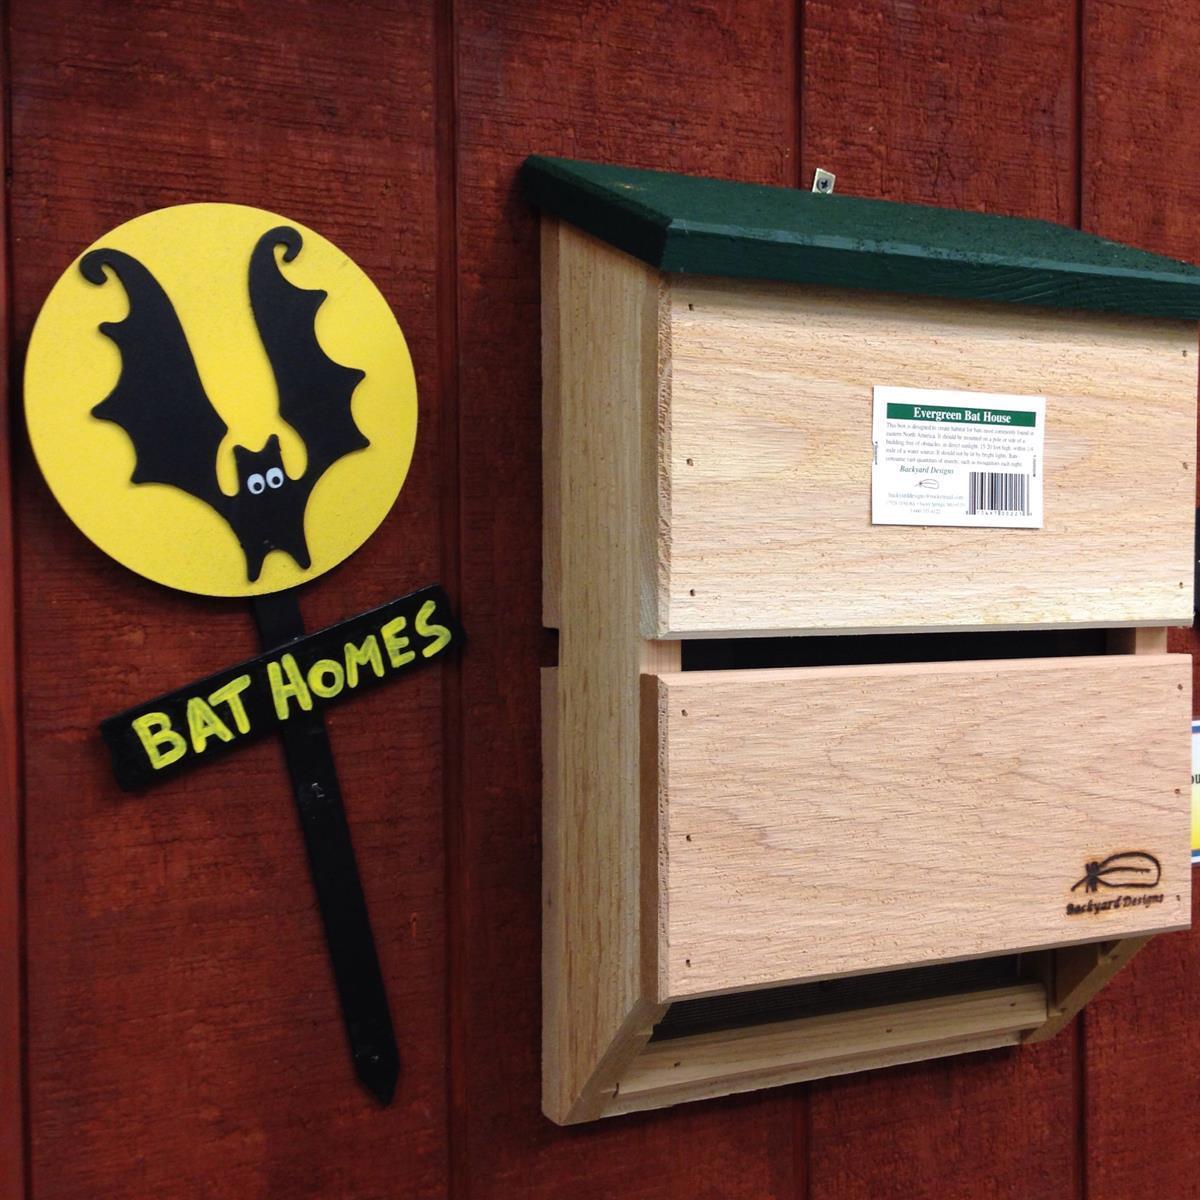 bat house, bats, mosquitoes, Zika